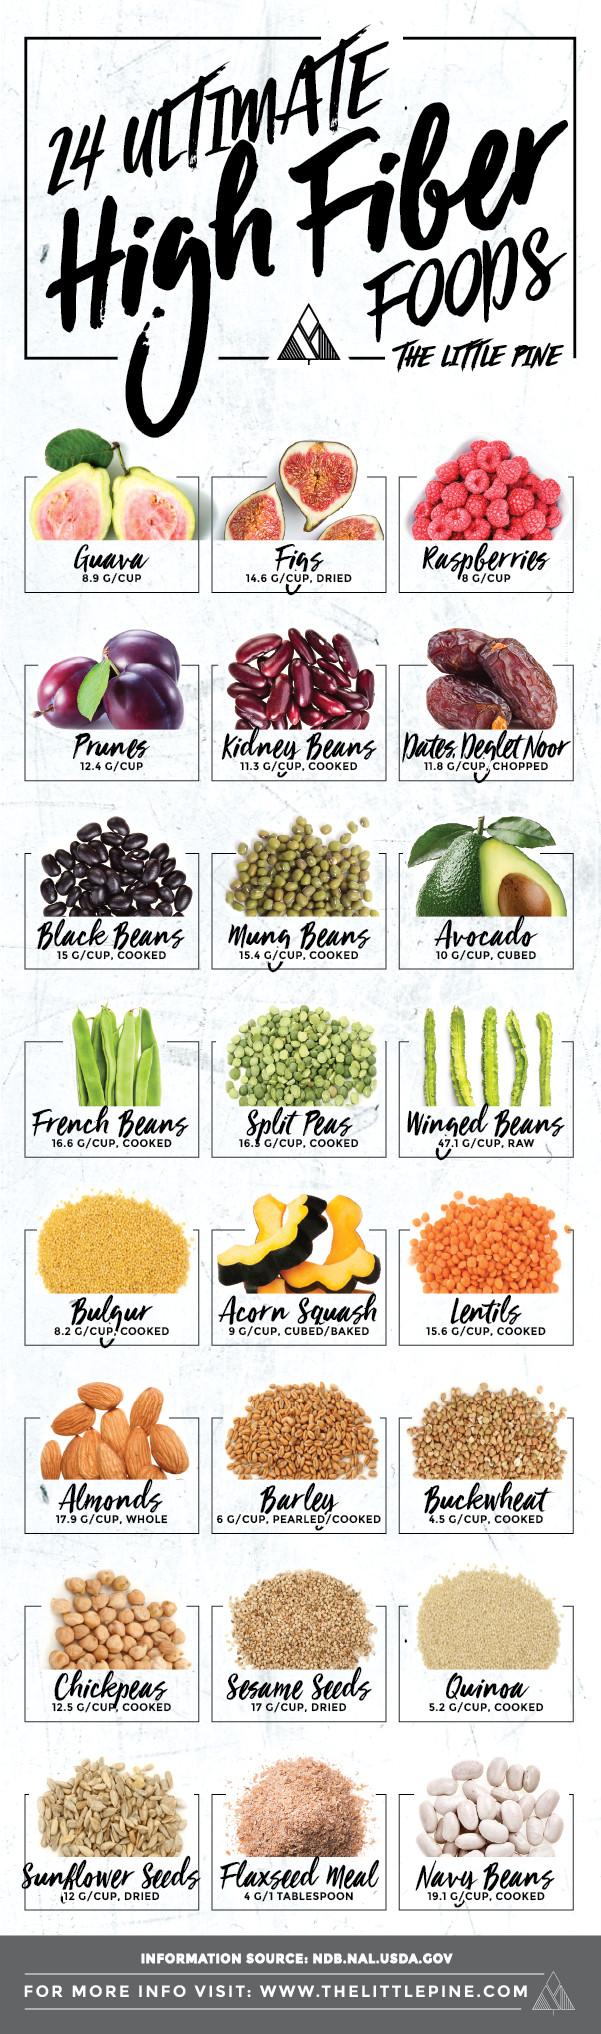 High Fiber Diet Recipes  24 Ultimate High Fiber Foods Little Pine Low Carb